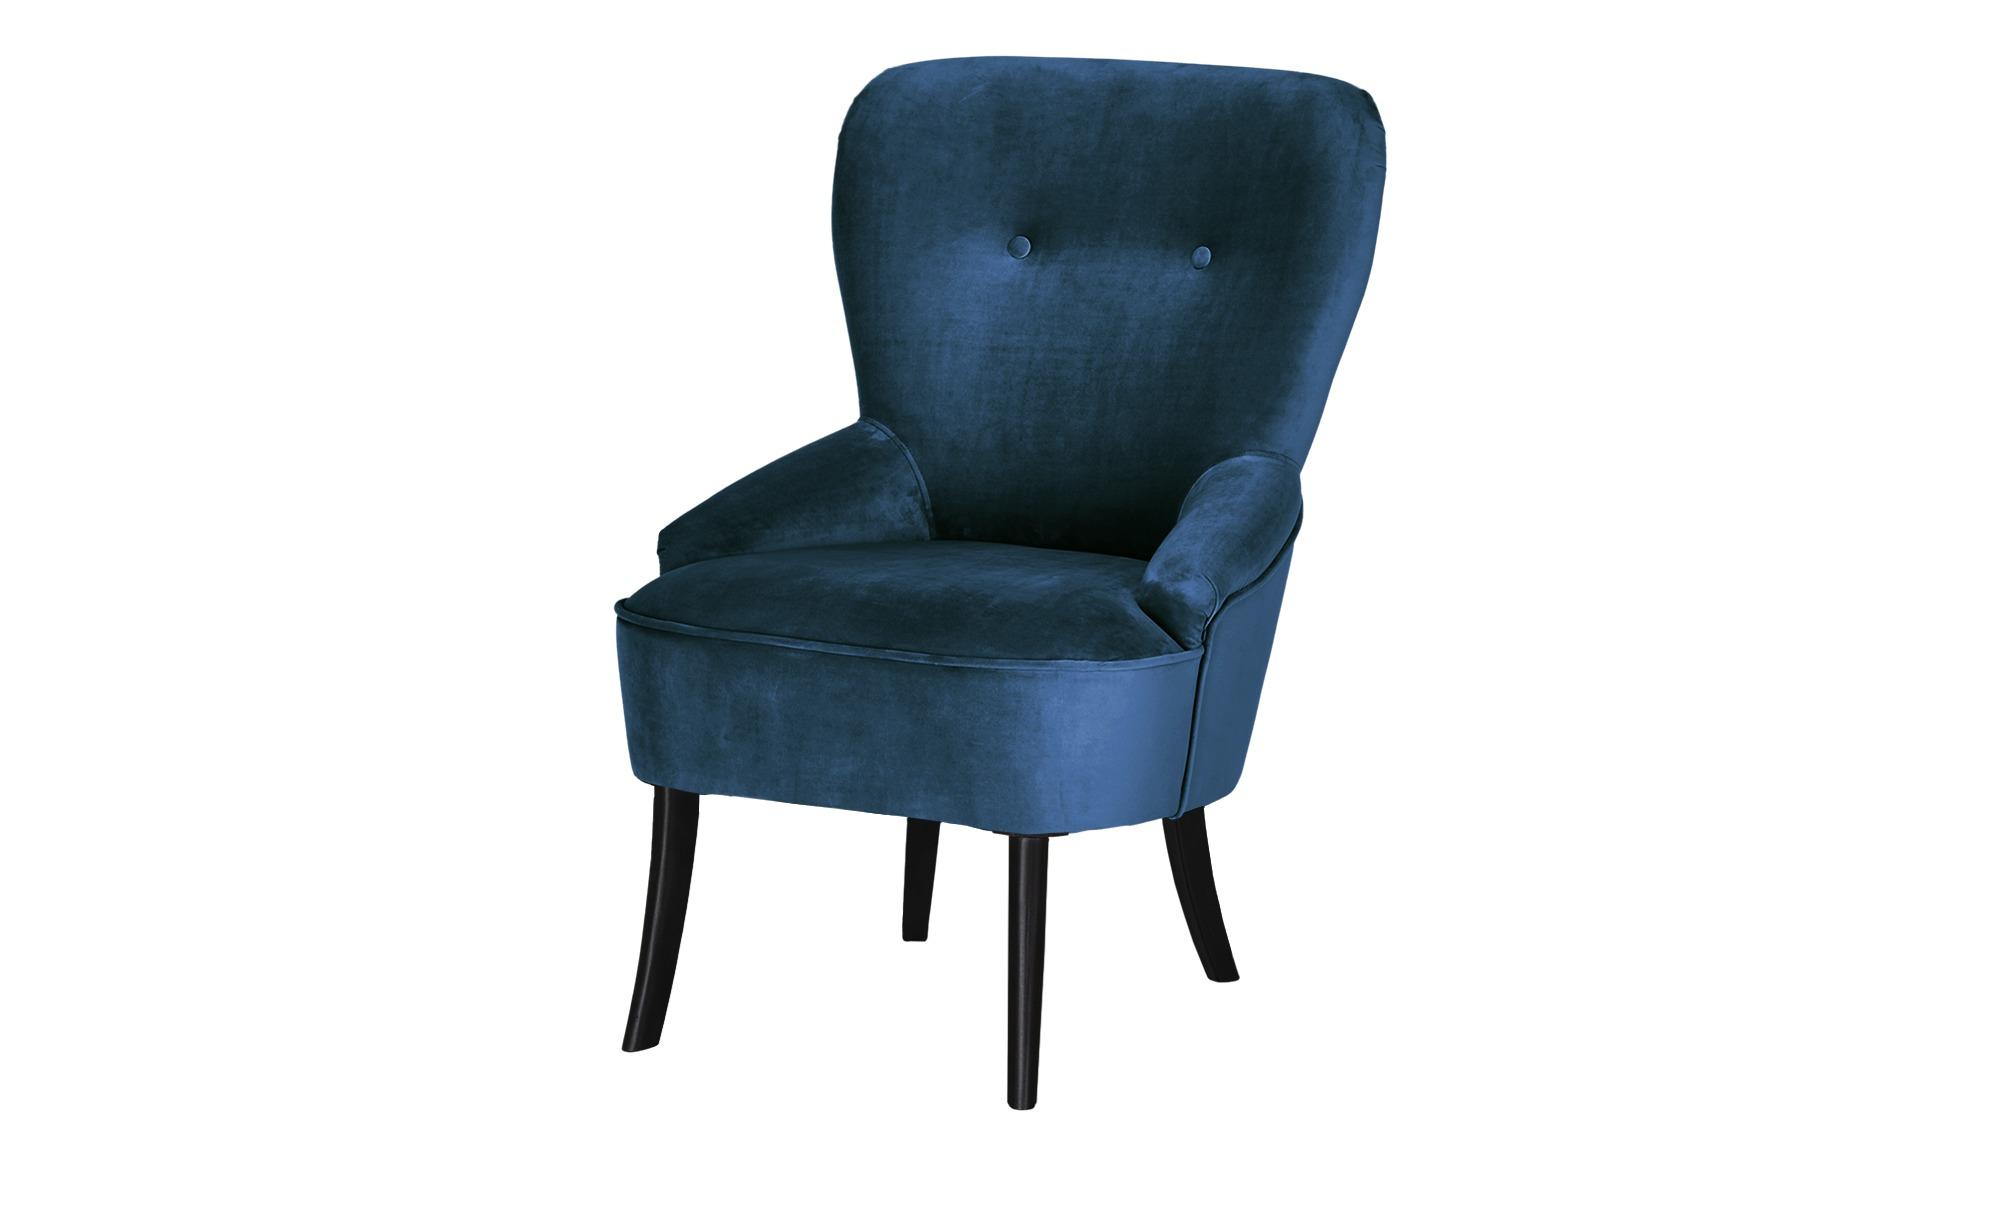 smart Sessel  Renia ¦ blau ¦ Maße (cm): B: 59 H: 88 T: 64 Polstermöbel > Sessel > Polstersessel - Höffner